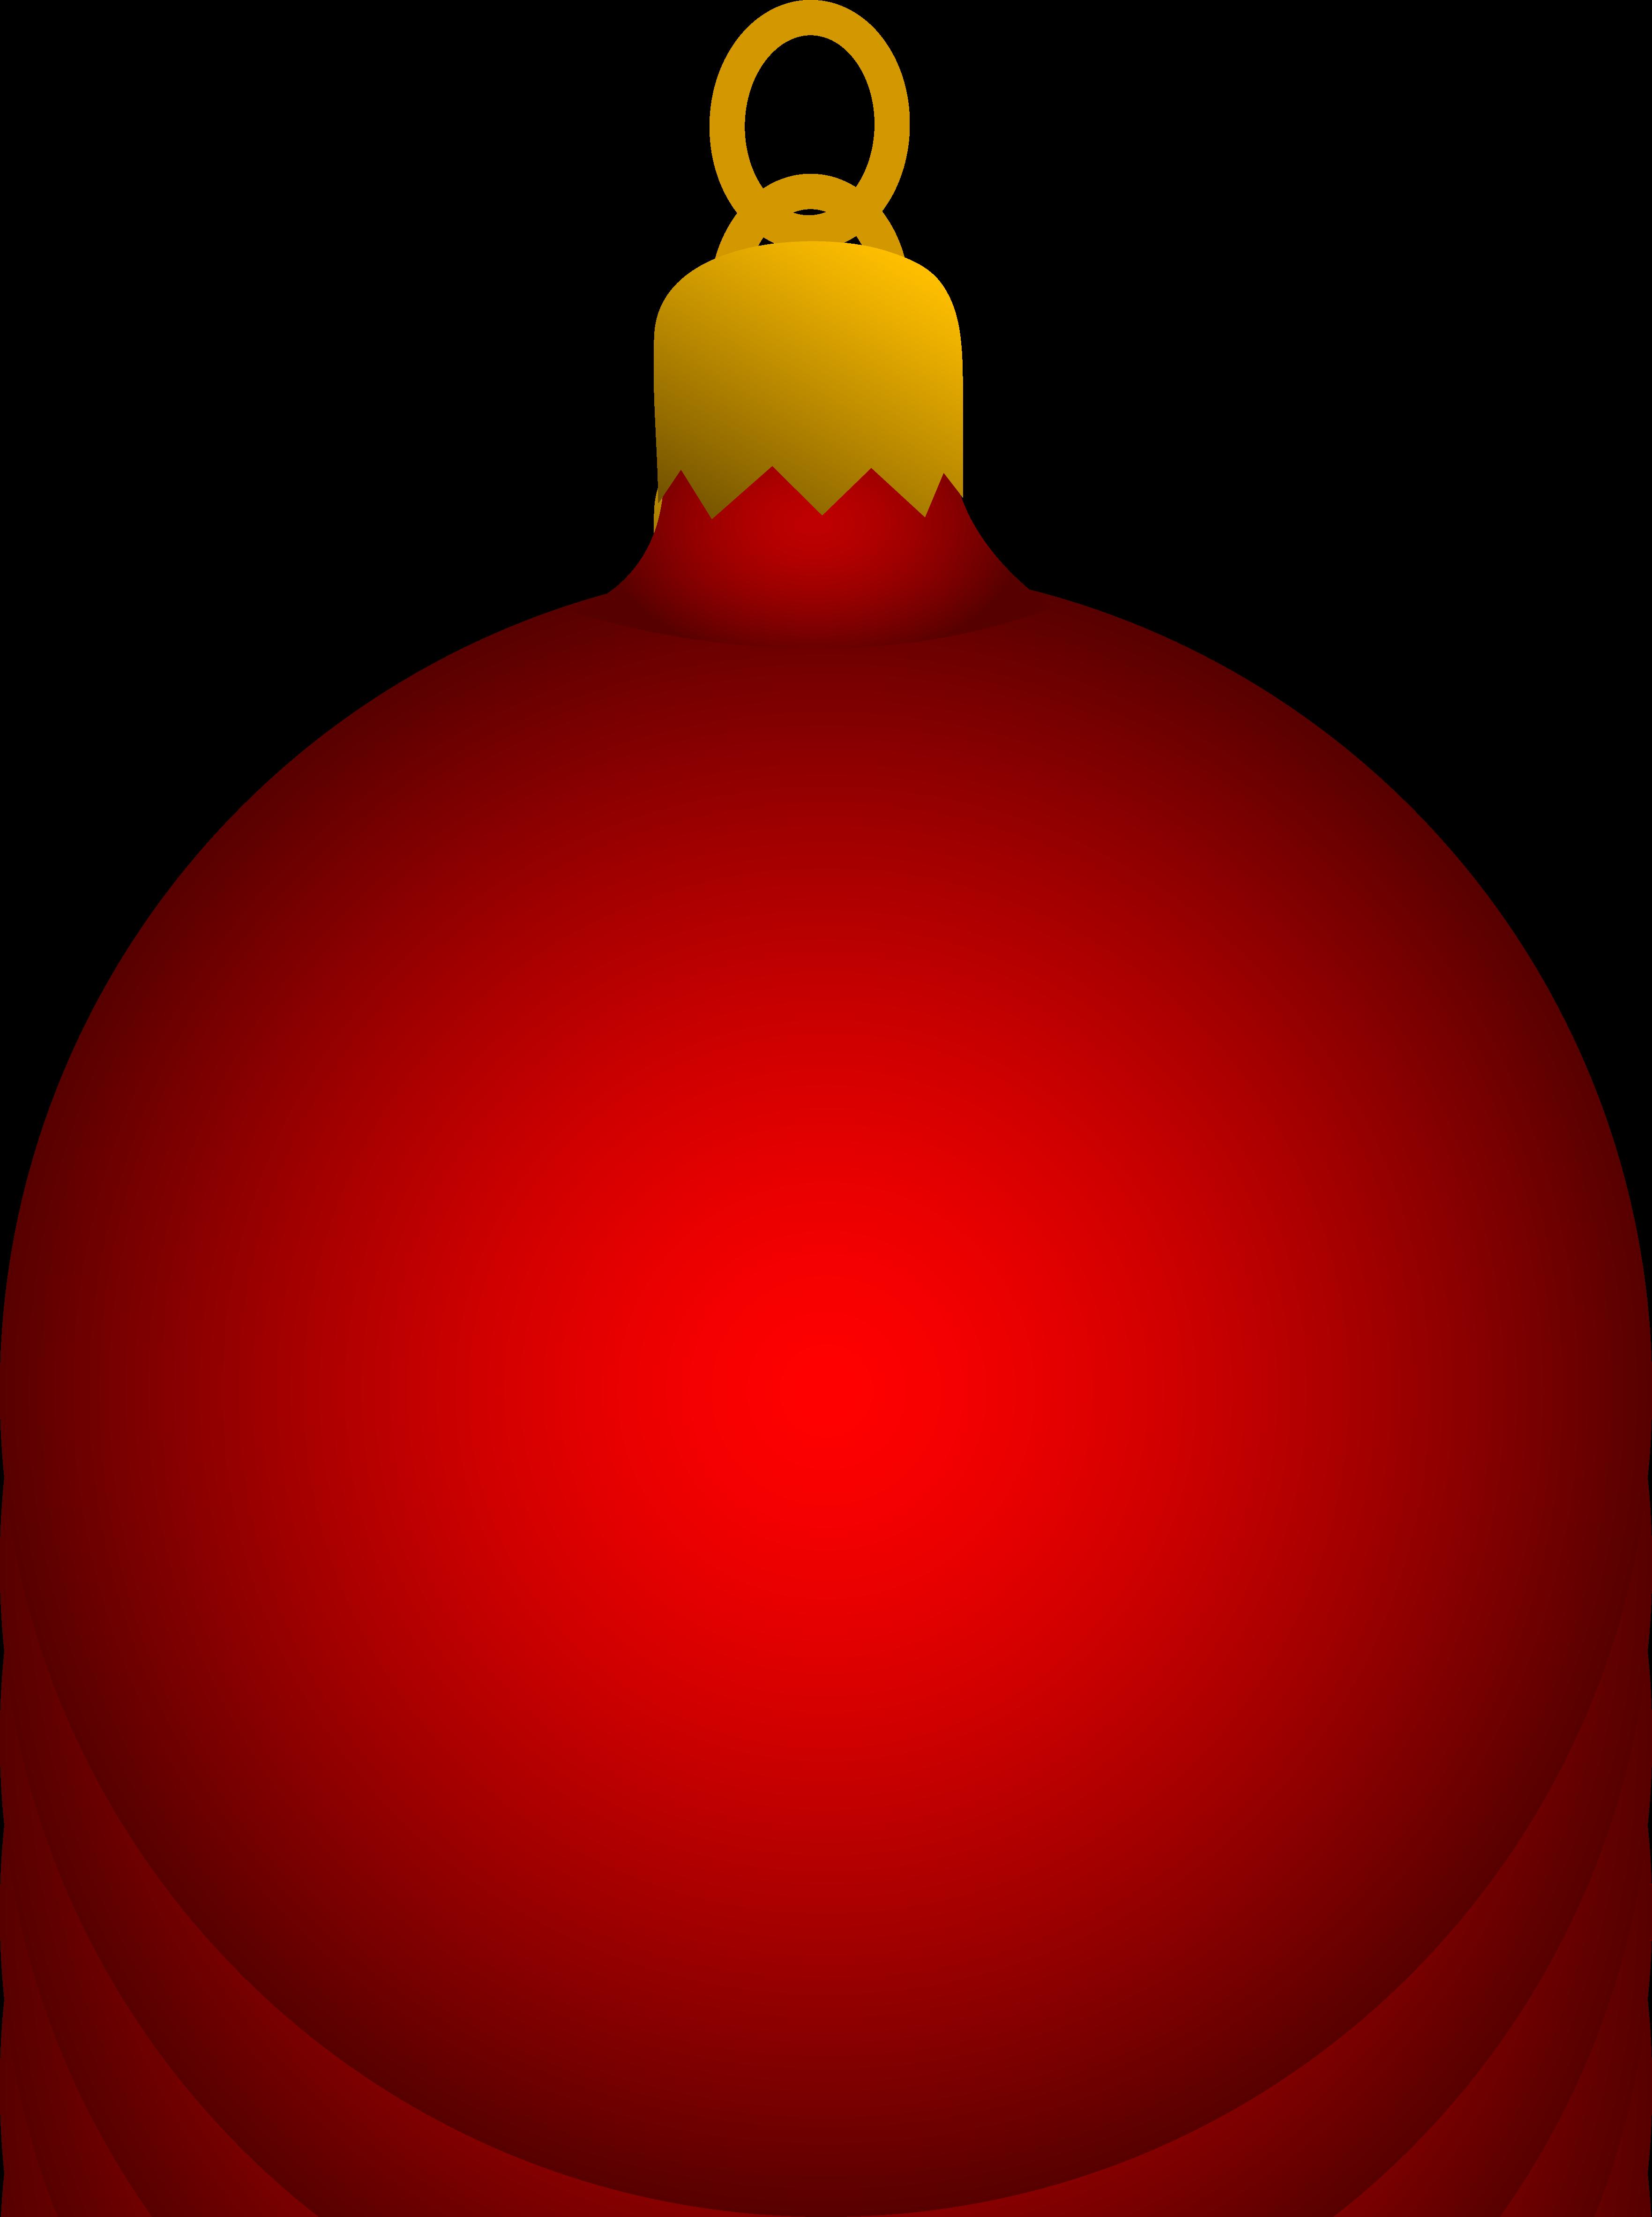 Clip Art Christmas Ornaments - Cliparts.co